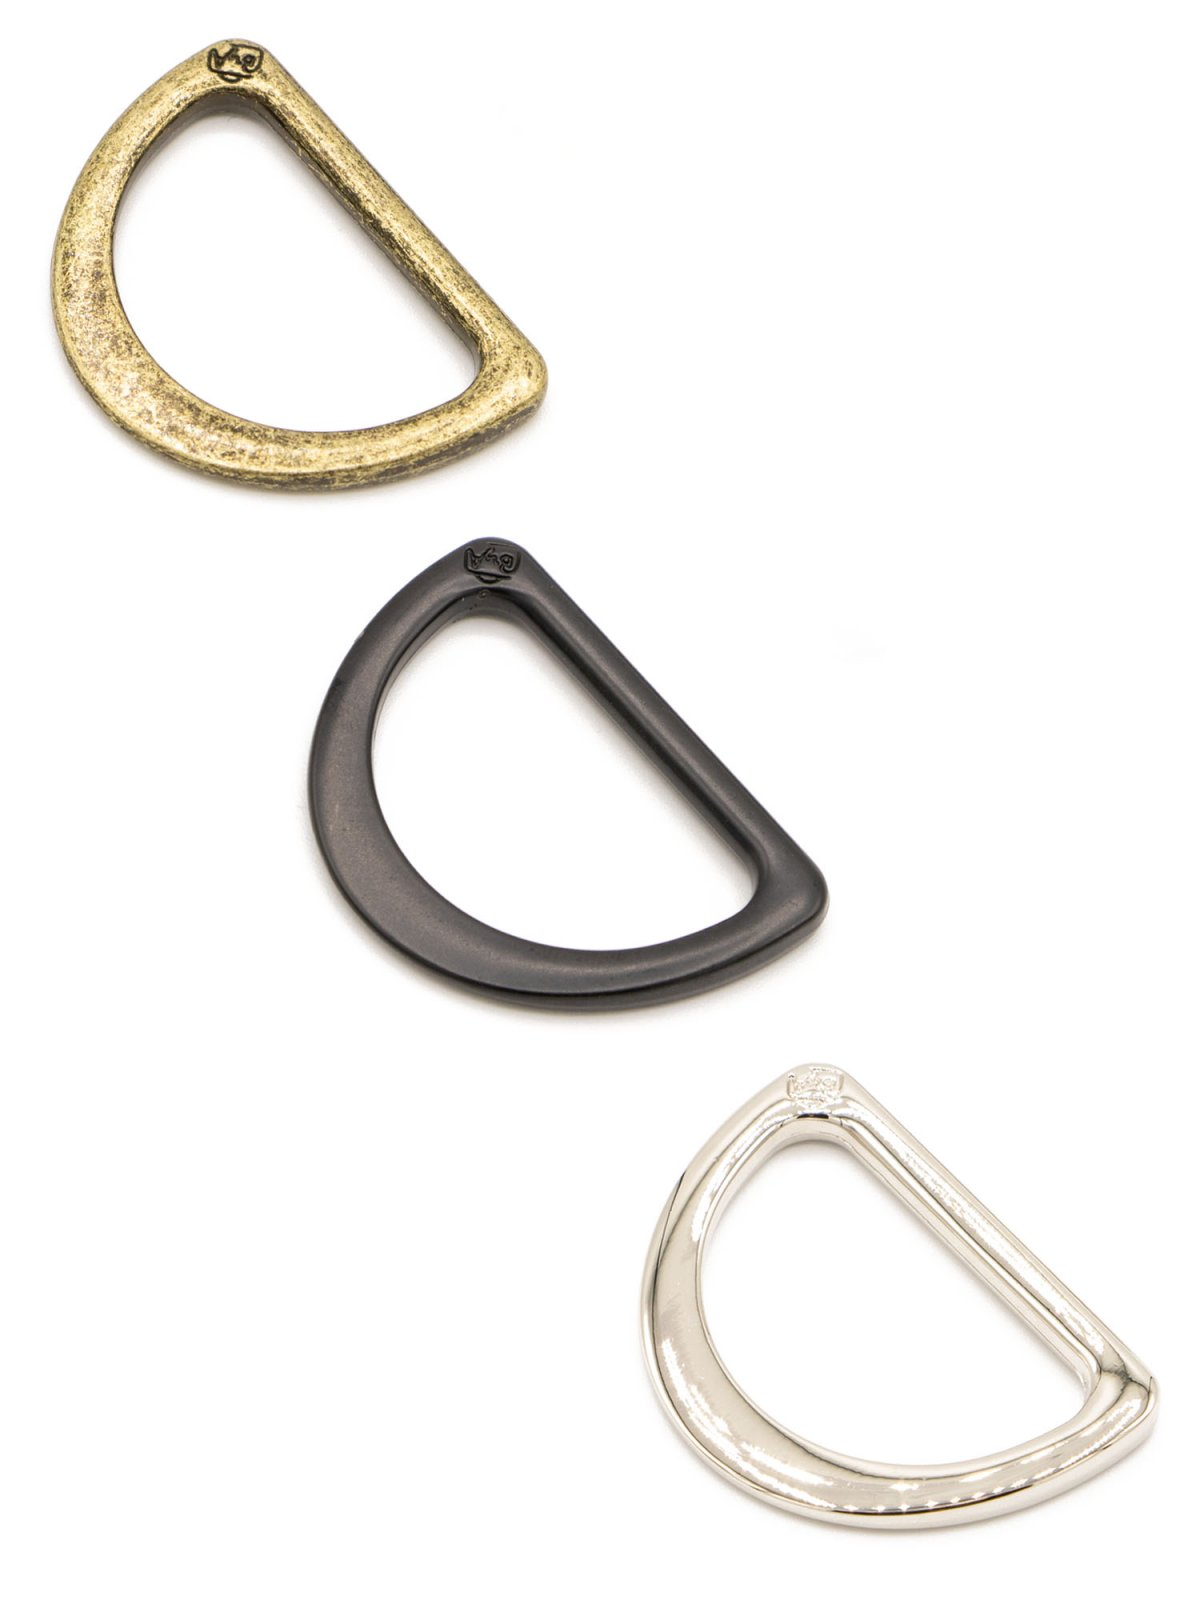 ByAnnie - Purse Parts - 1 D Ring Flat - Black Metal